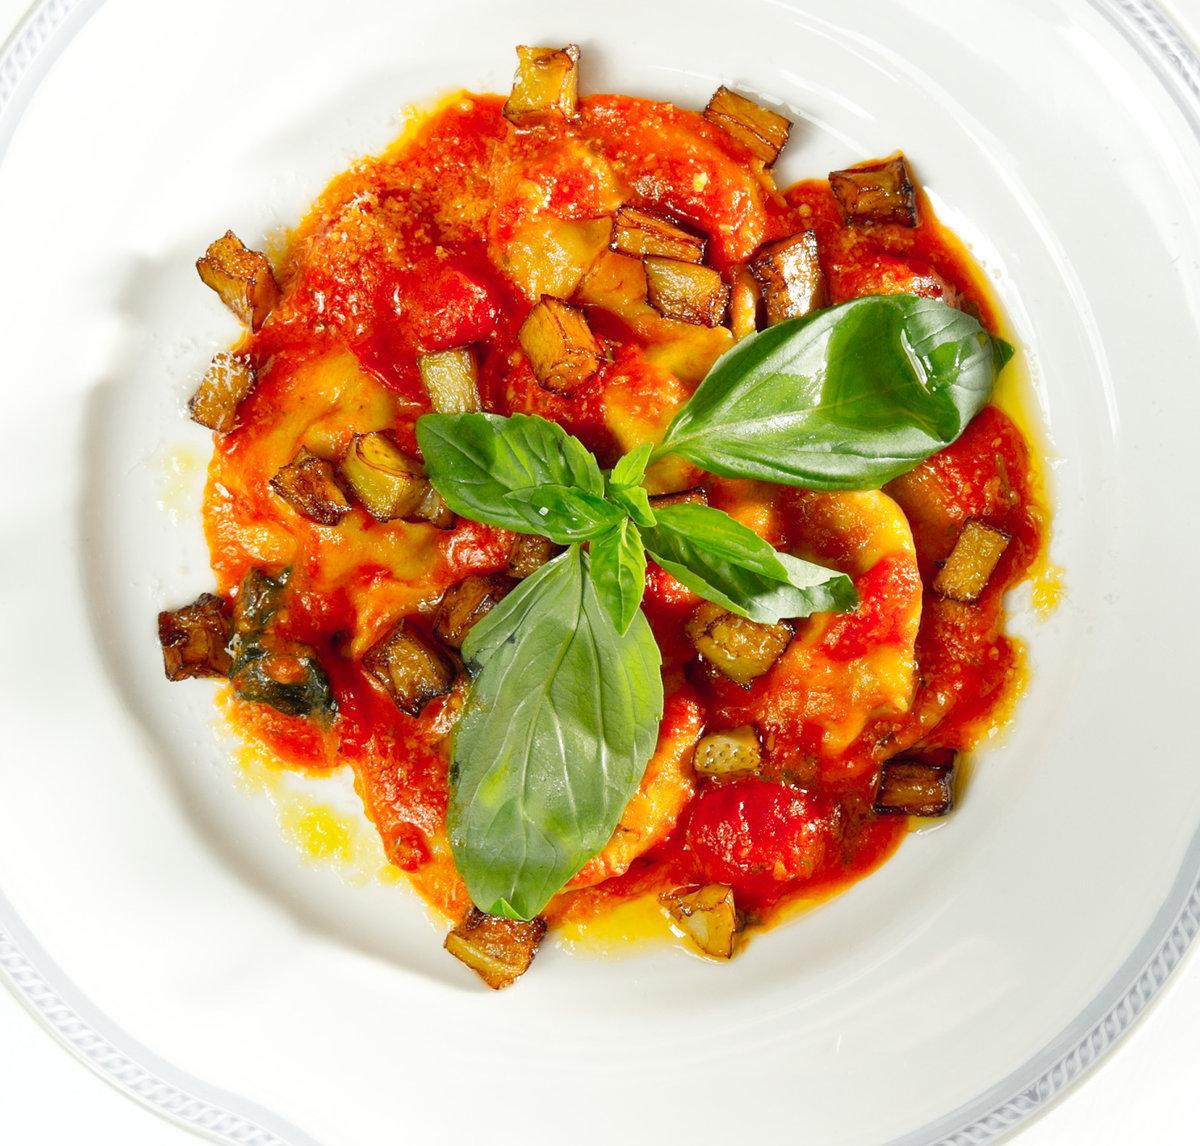 Паста с баклажанами и помидорами рецепт